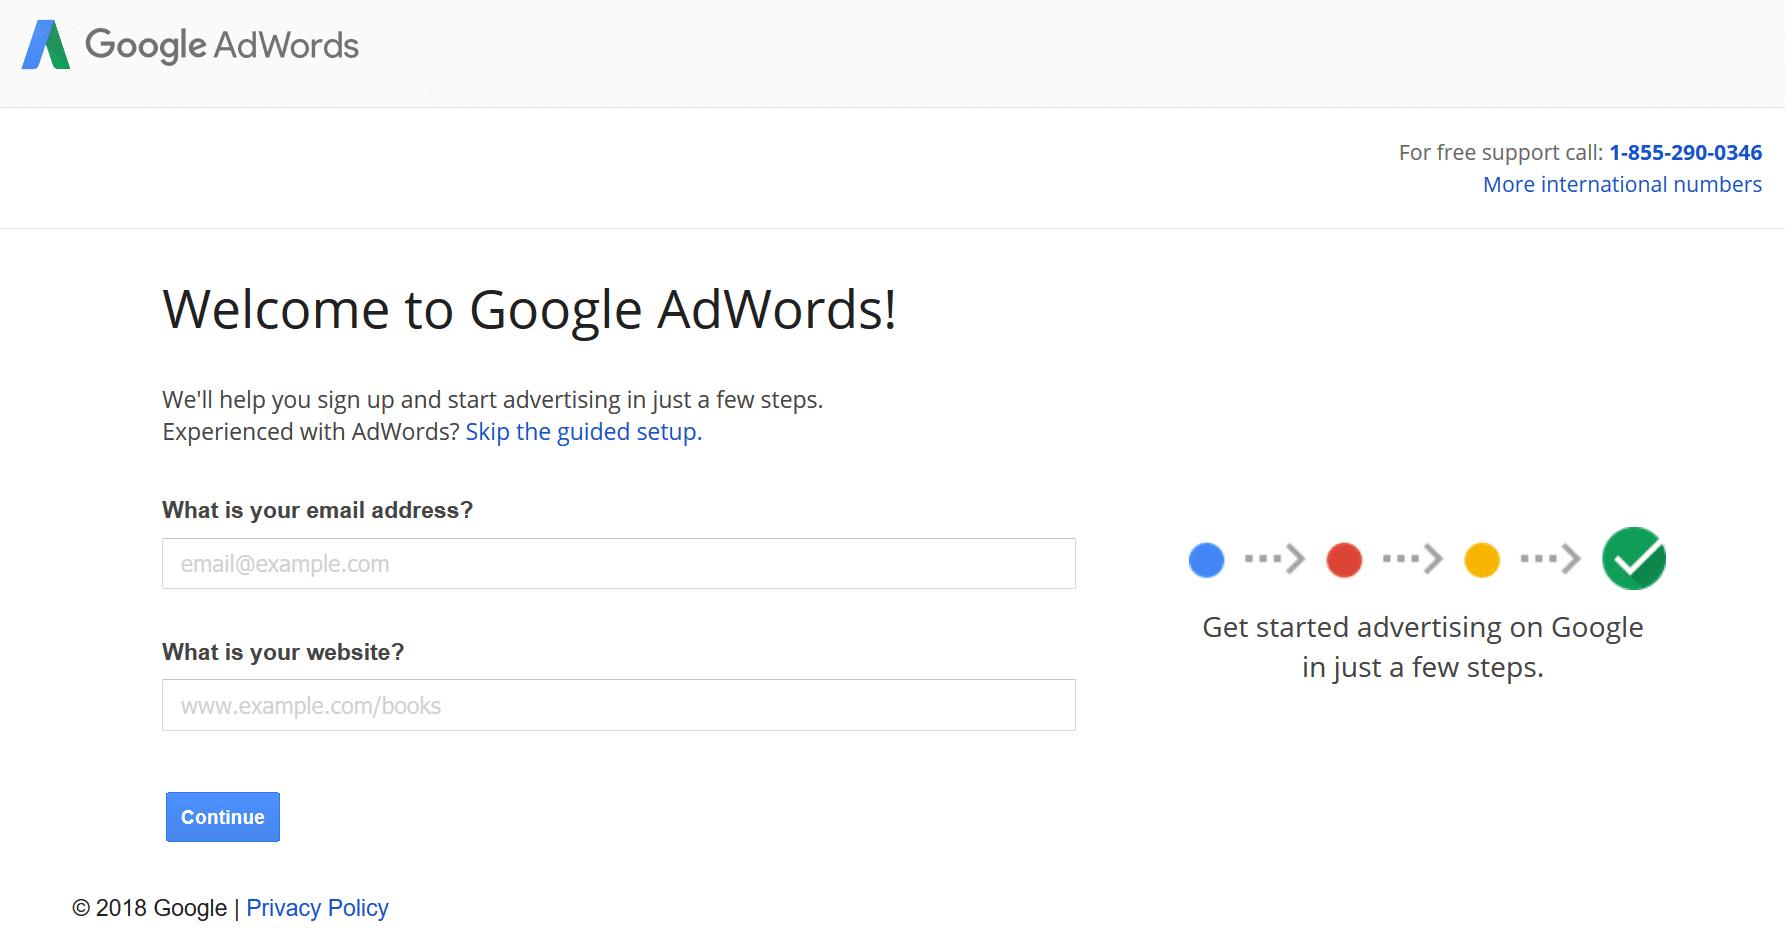 S'inscrire à Google AdWords